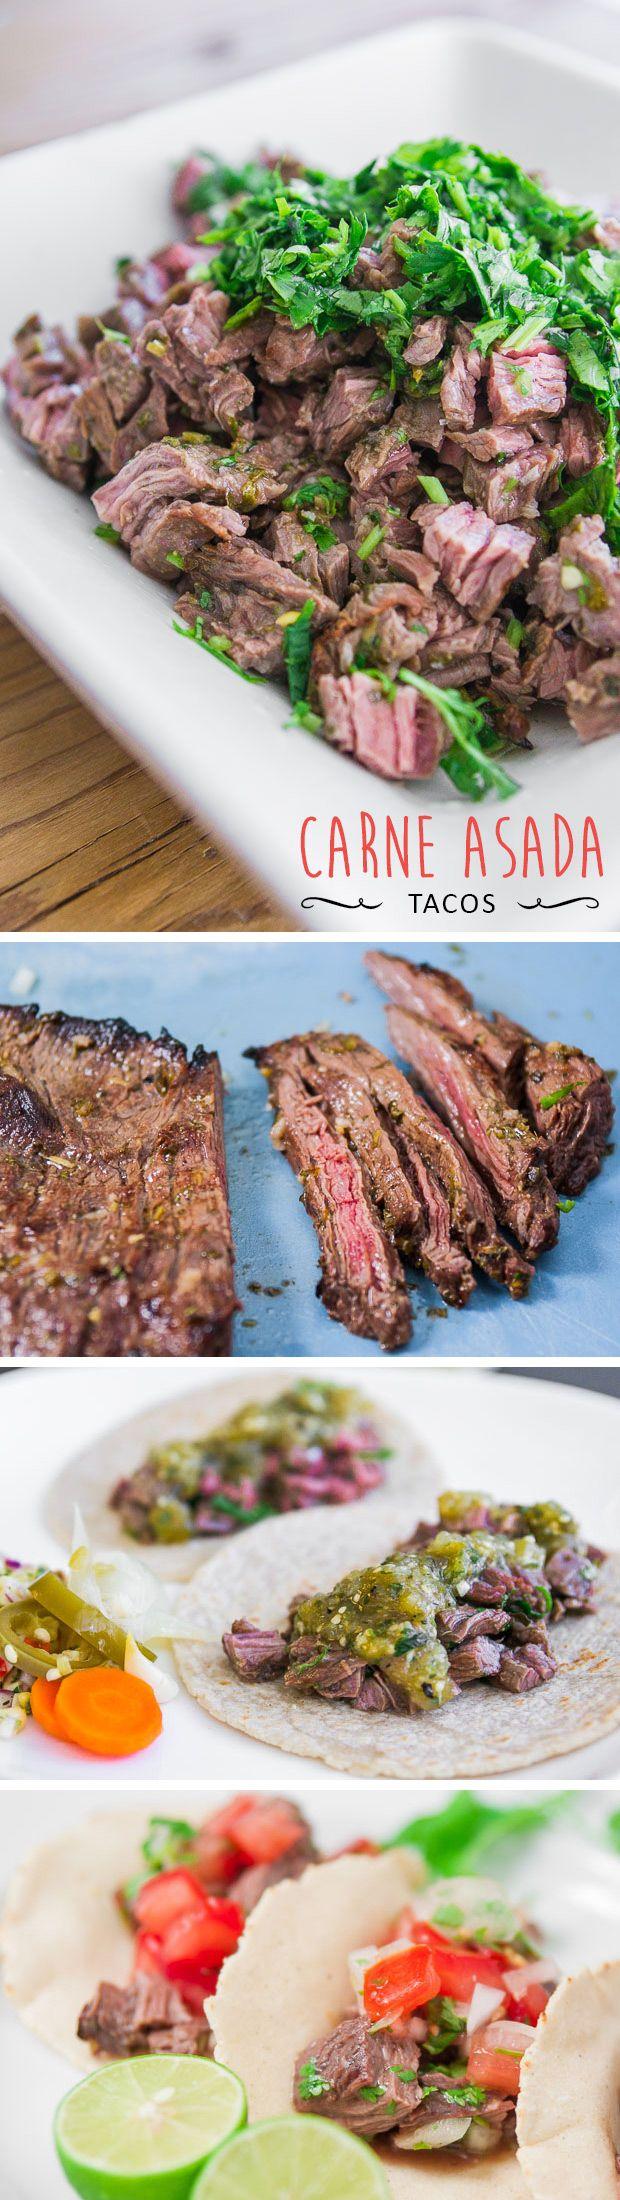 Carne Asada on Pinterest